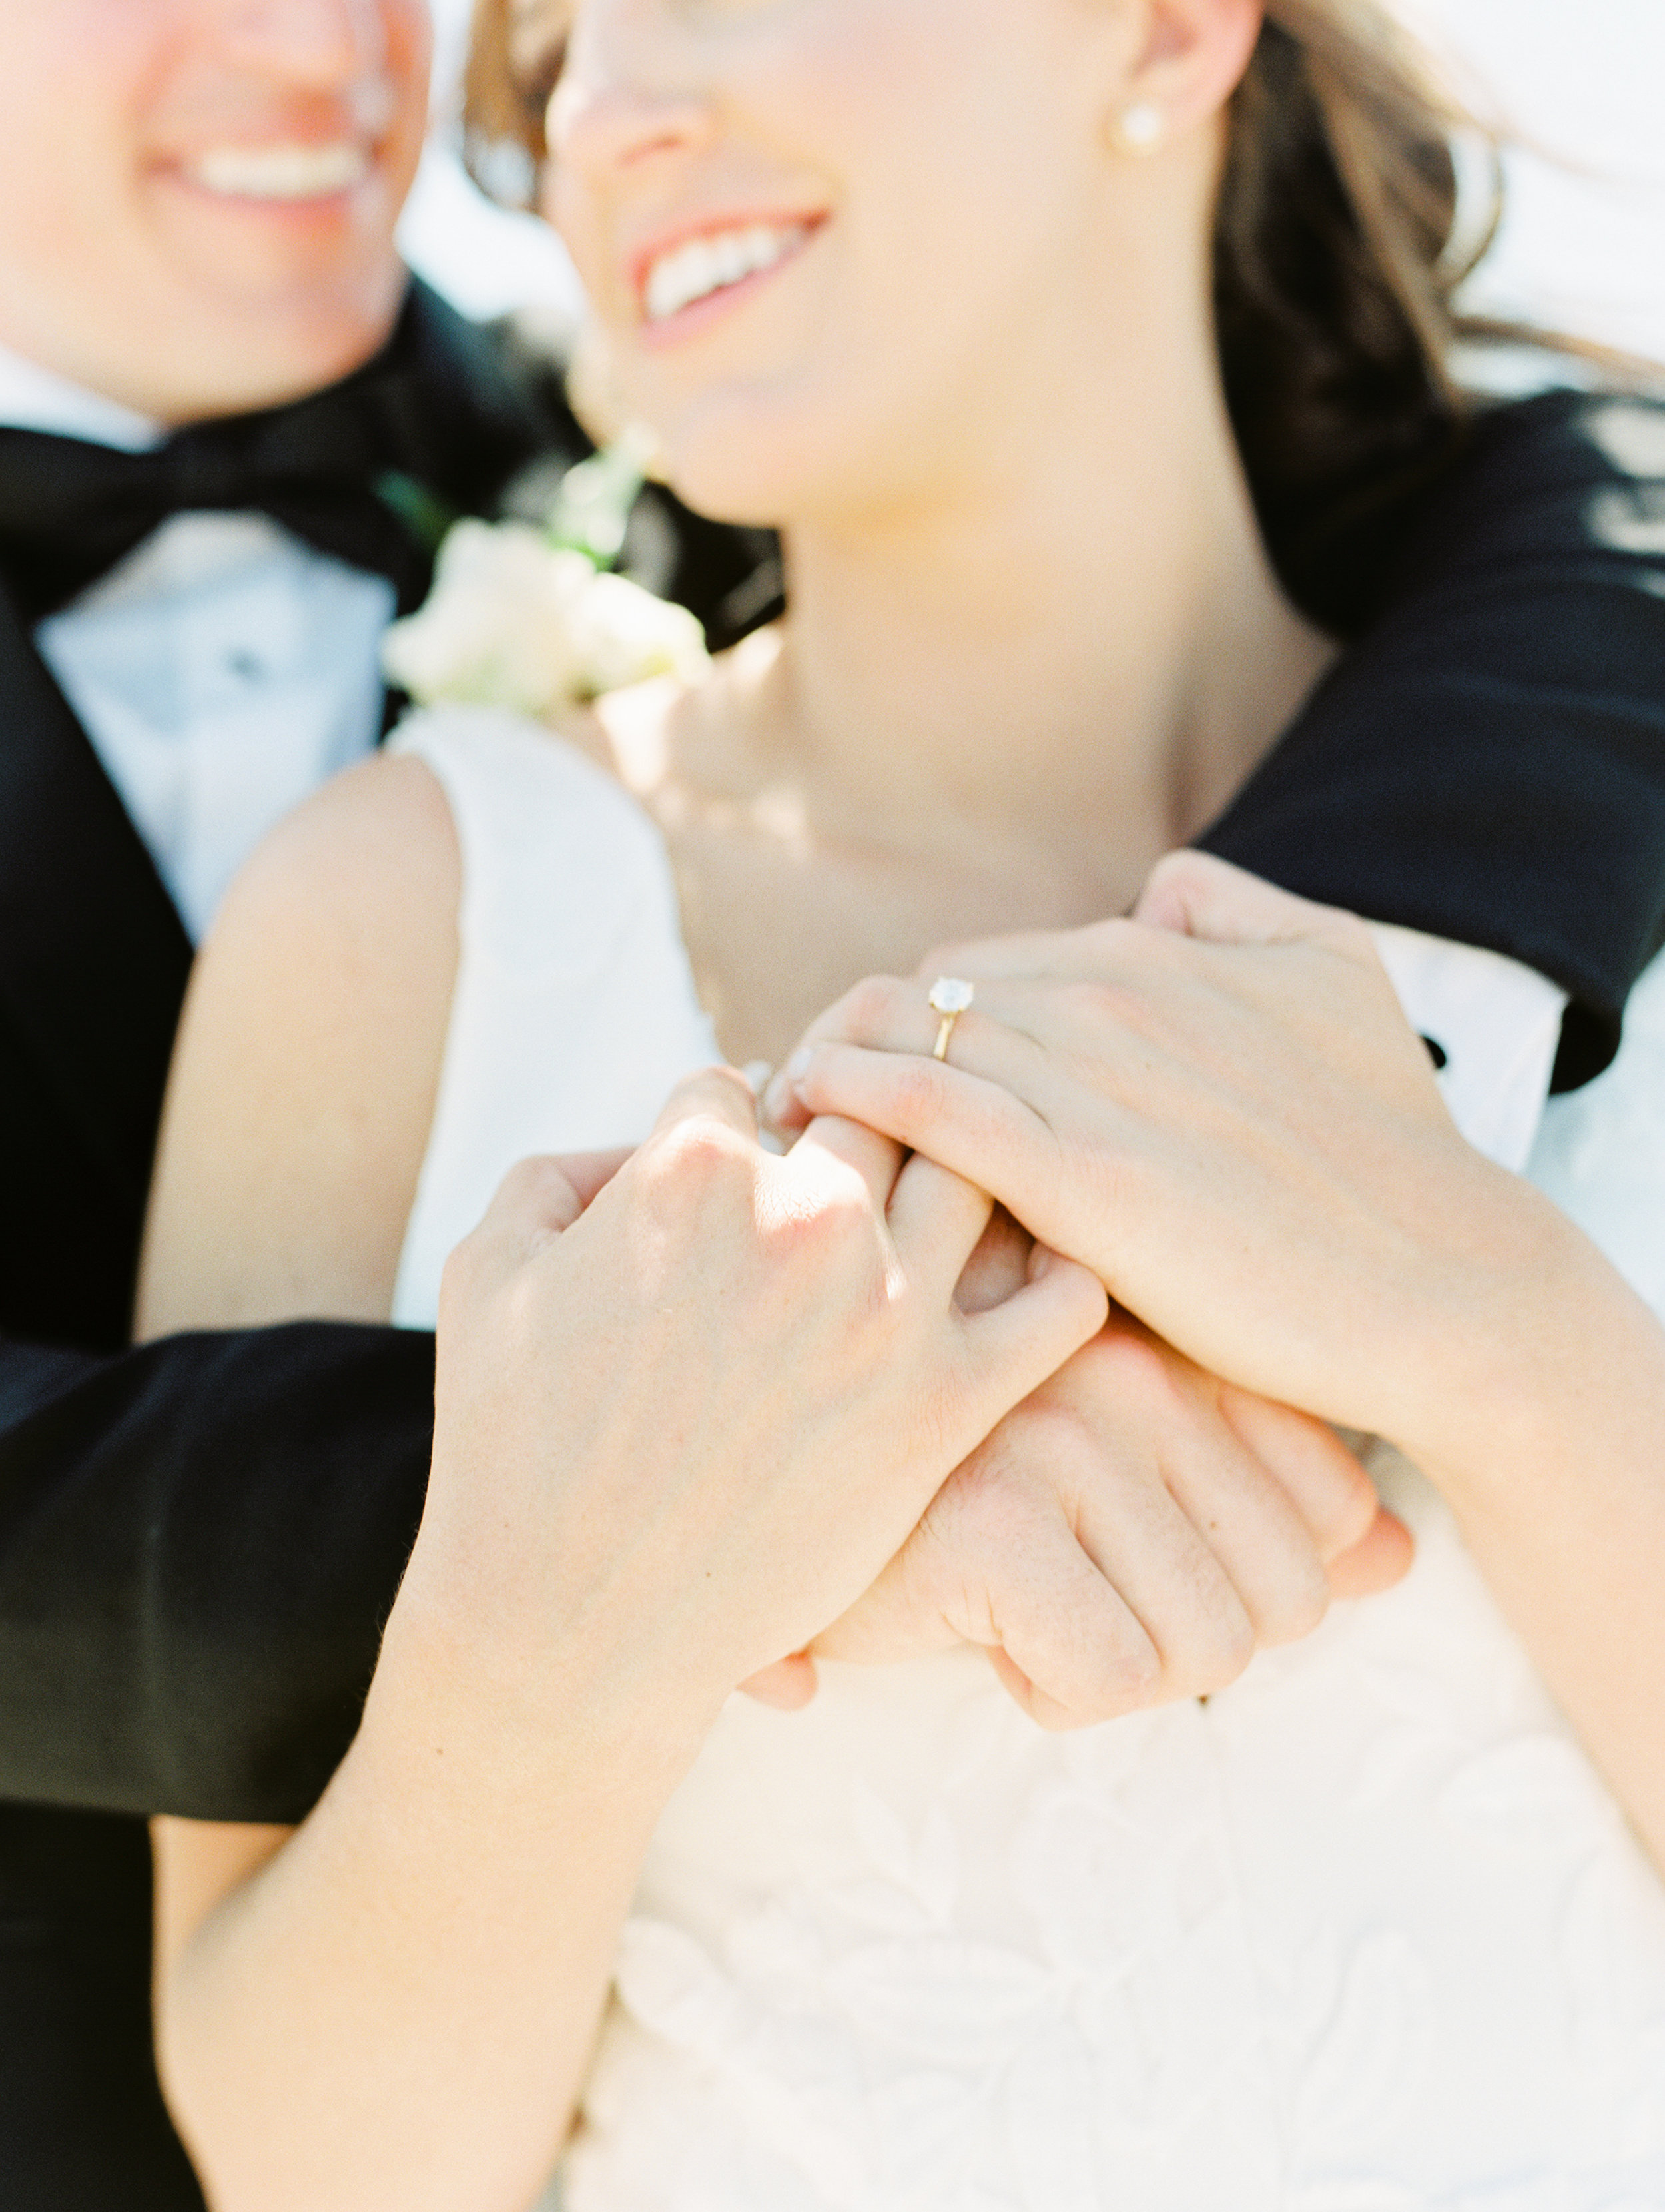 DeGuilio+Wedding+Bridal+Partyf-59.jpg